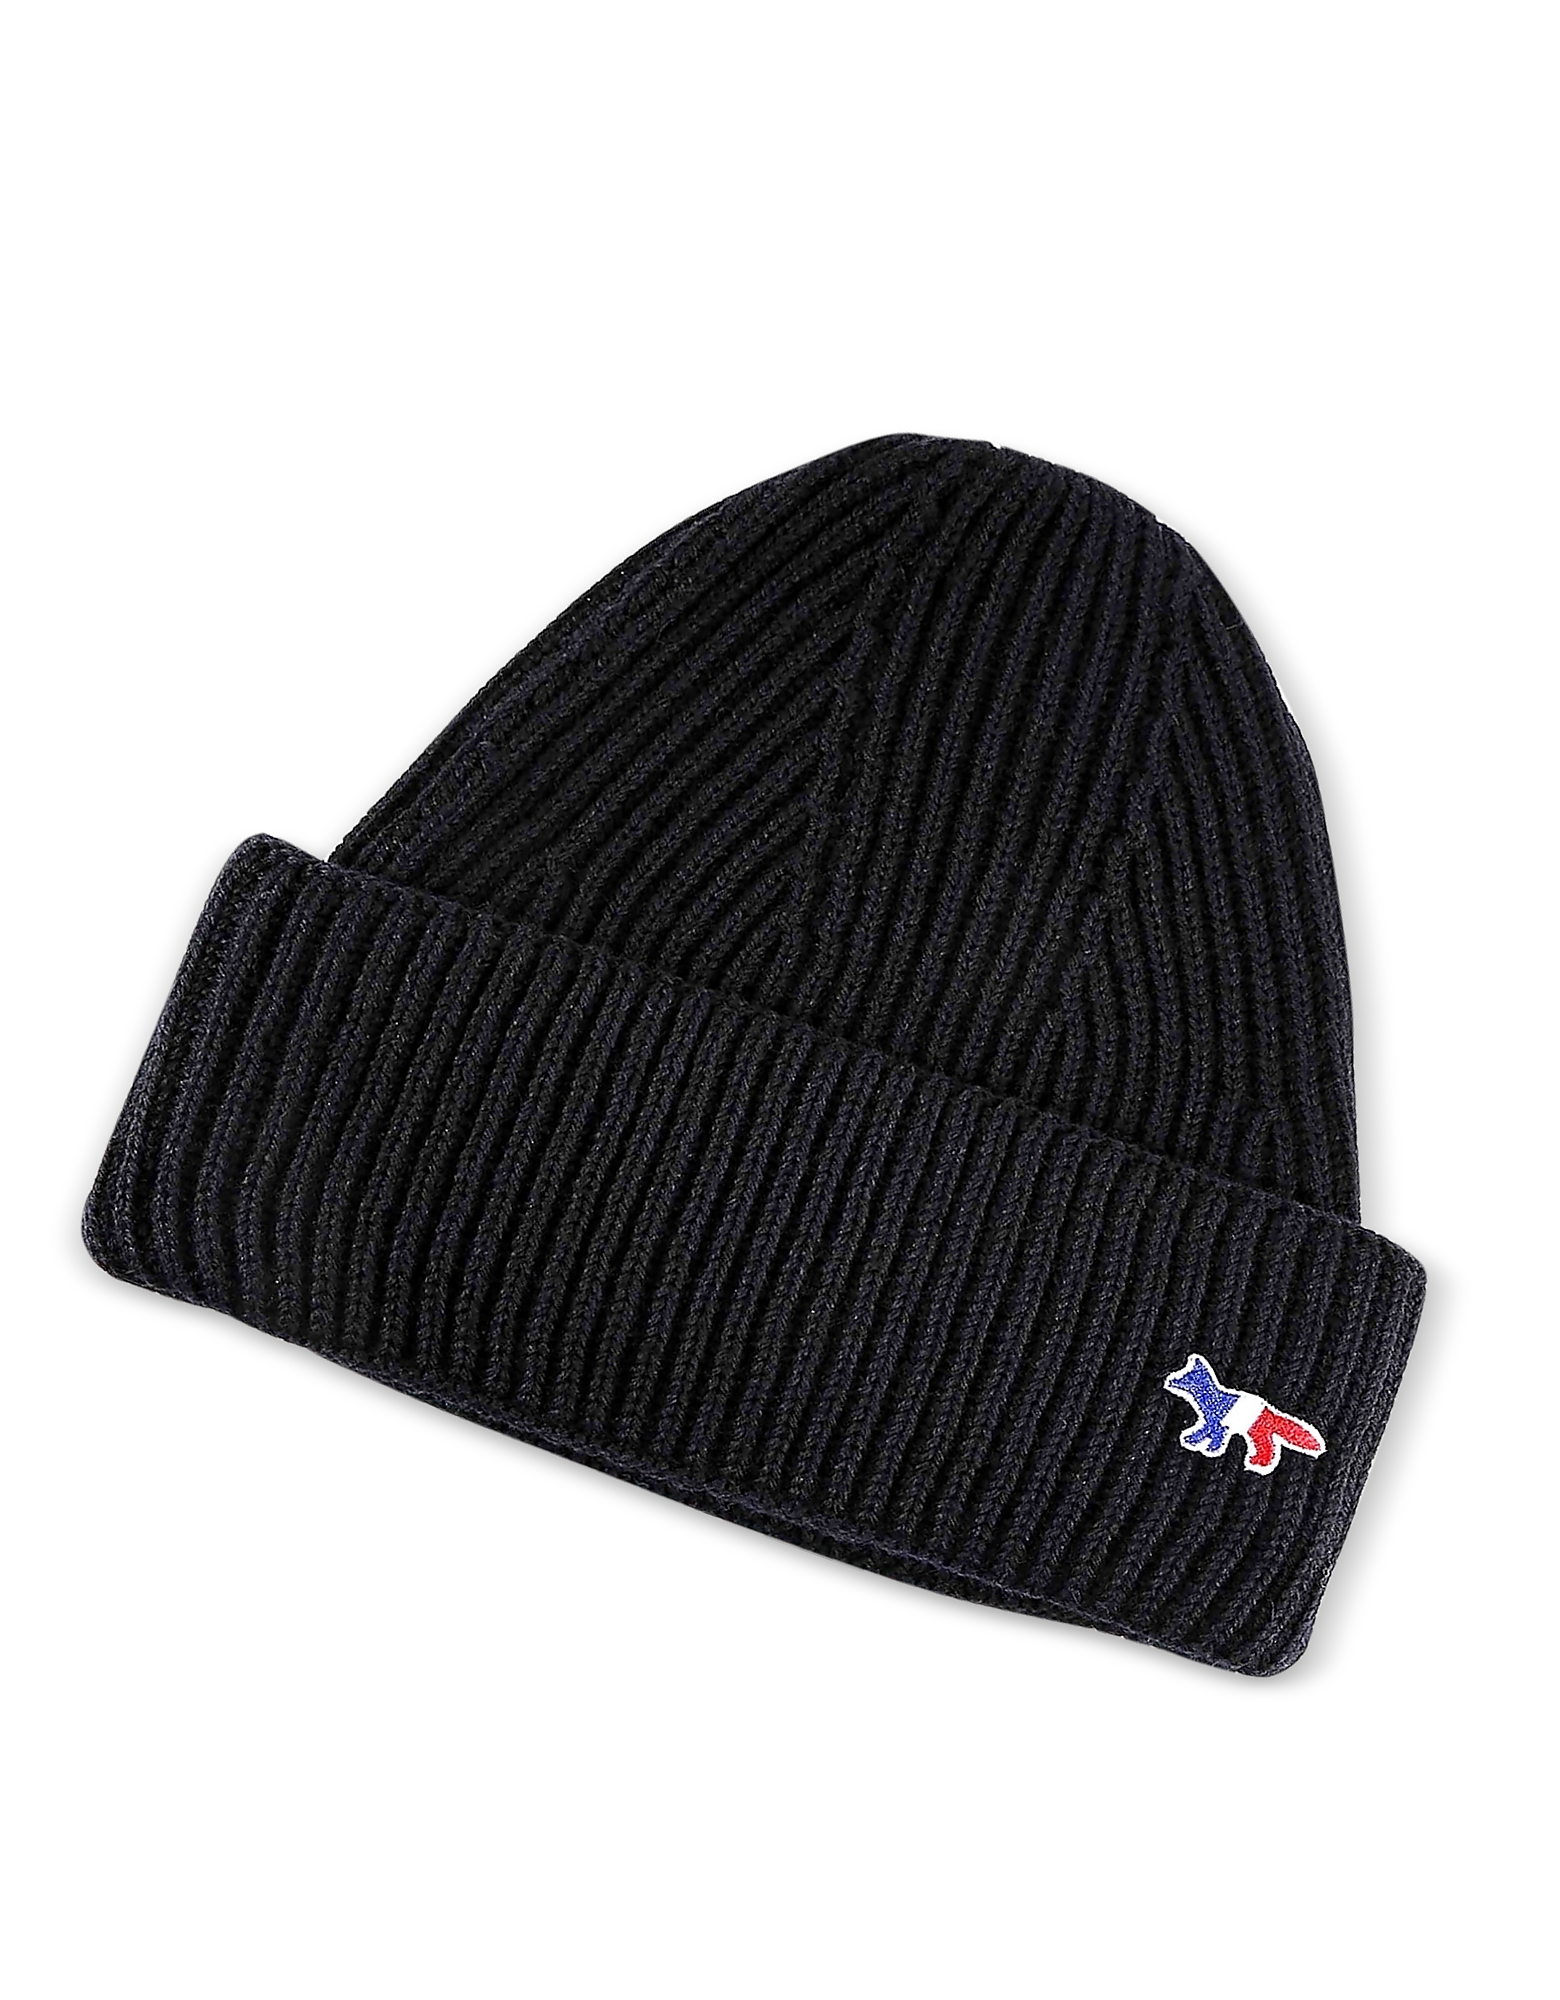 Maison Kitsuné Men's Hats, Ribbed Wool Hat w/Fox Patch